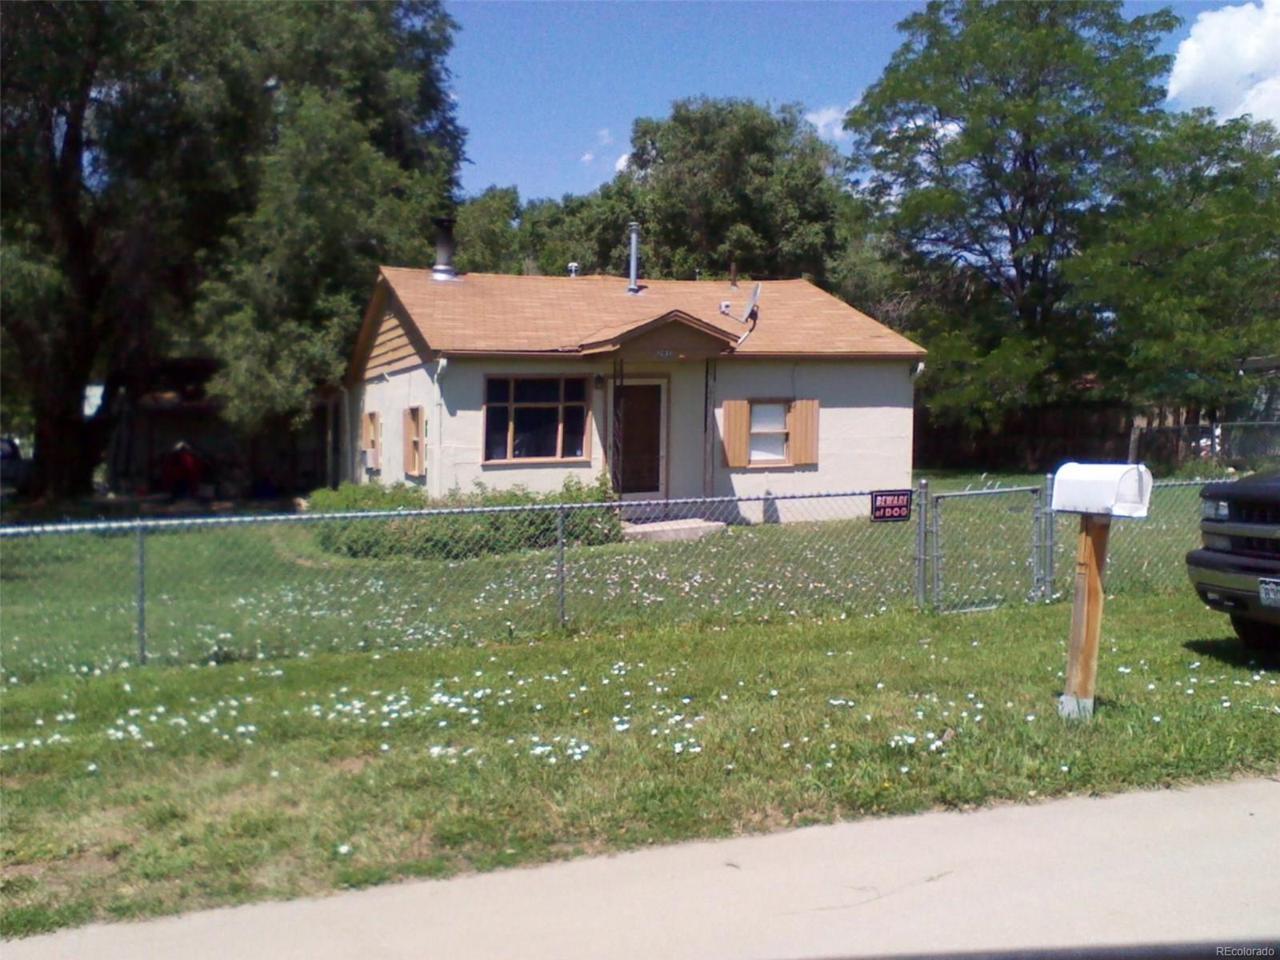 205 Lamar Street, Lakewood, CO 80226 (MLS #3408002) :: 8z Real Estate